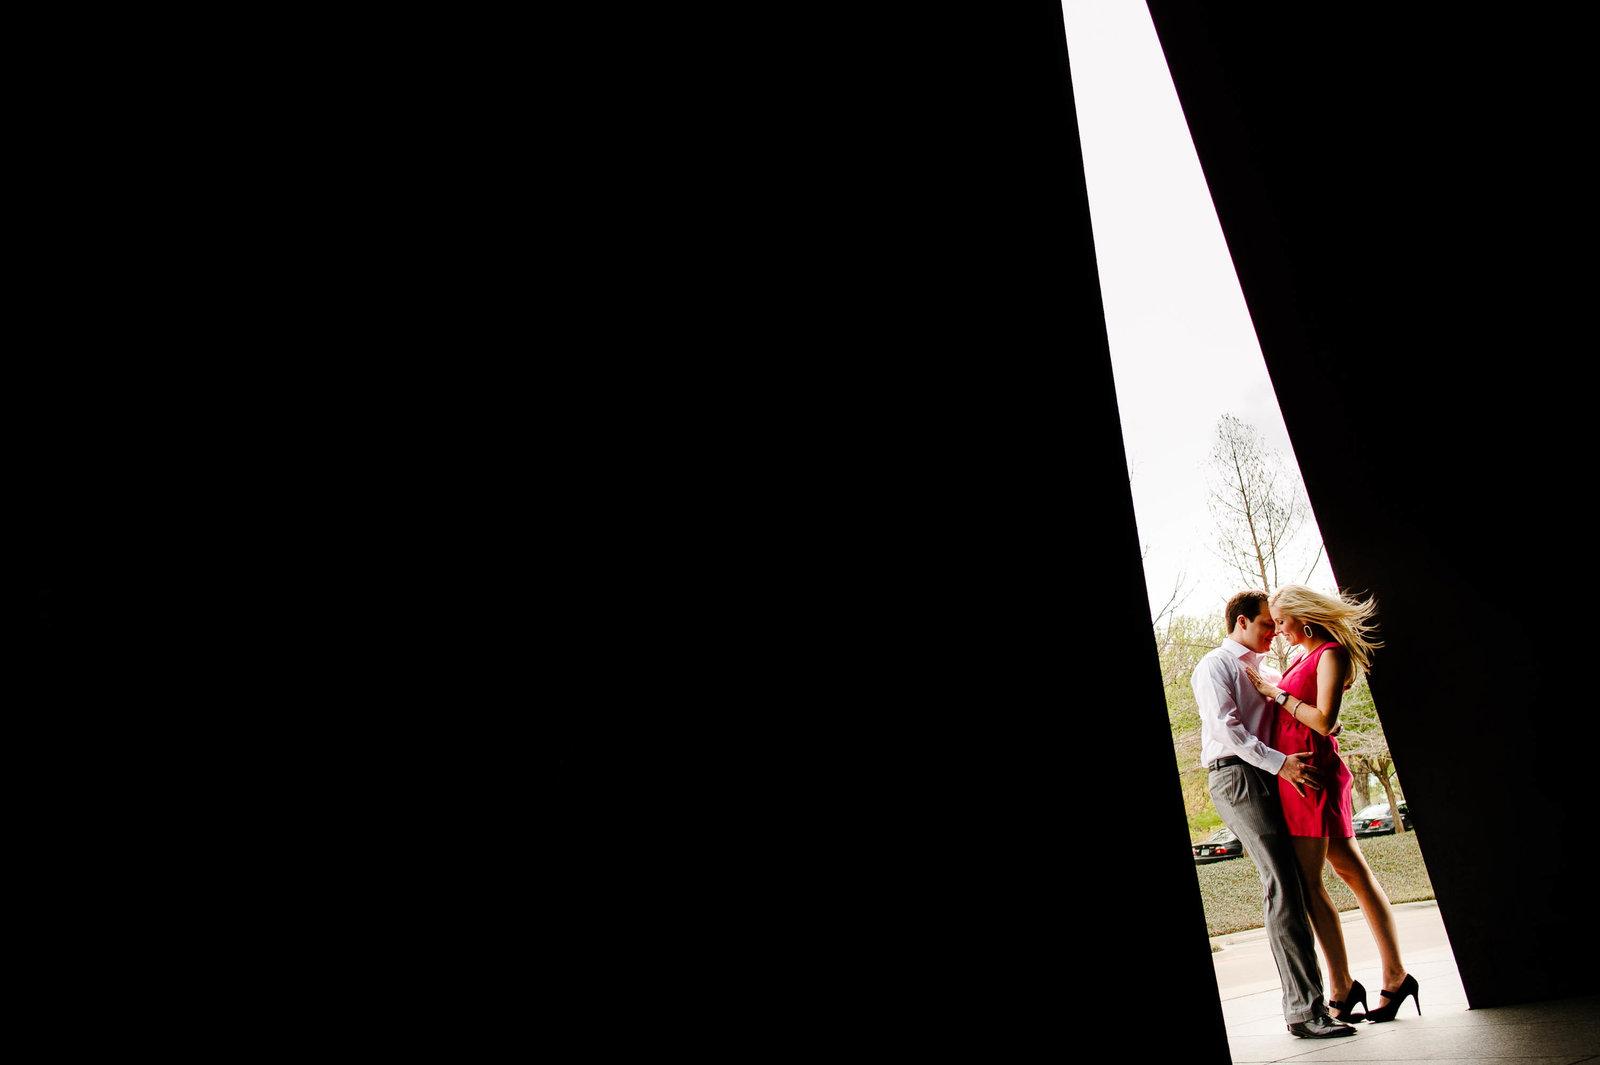 034-El-paso-wedding-photographer-El Paso Wedding Photographer_E51